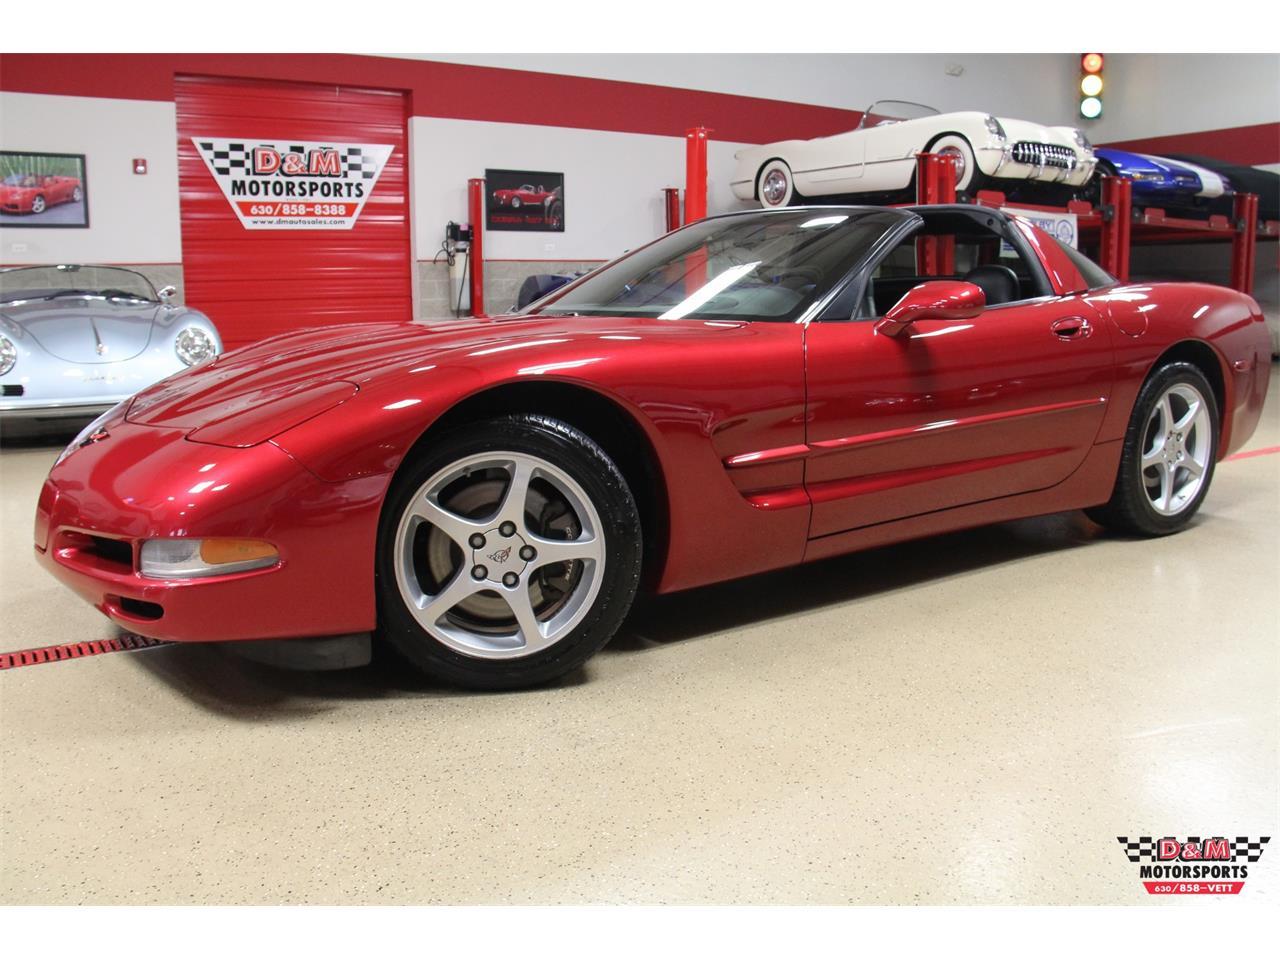 Large Picture of 2000 Chevrolet Corvette located in Illinois - LVA3